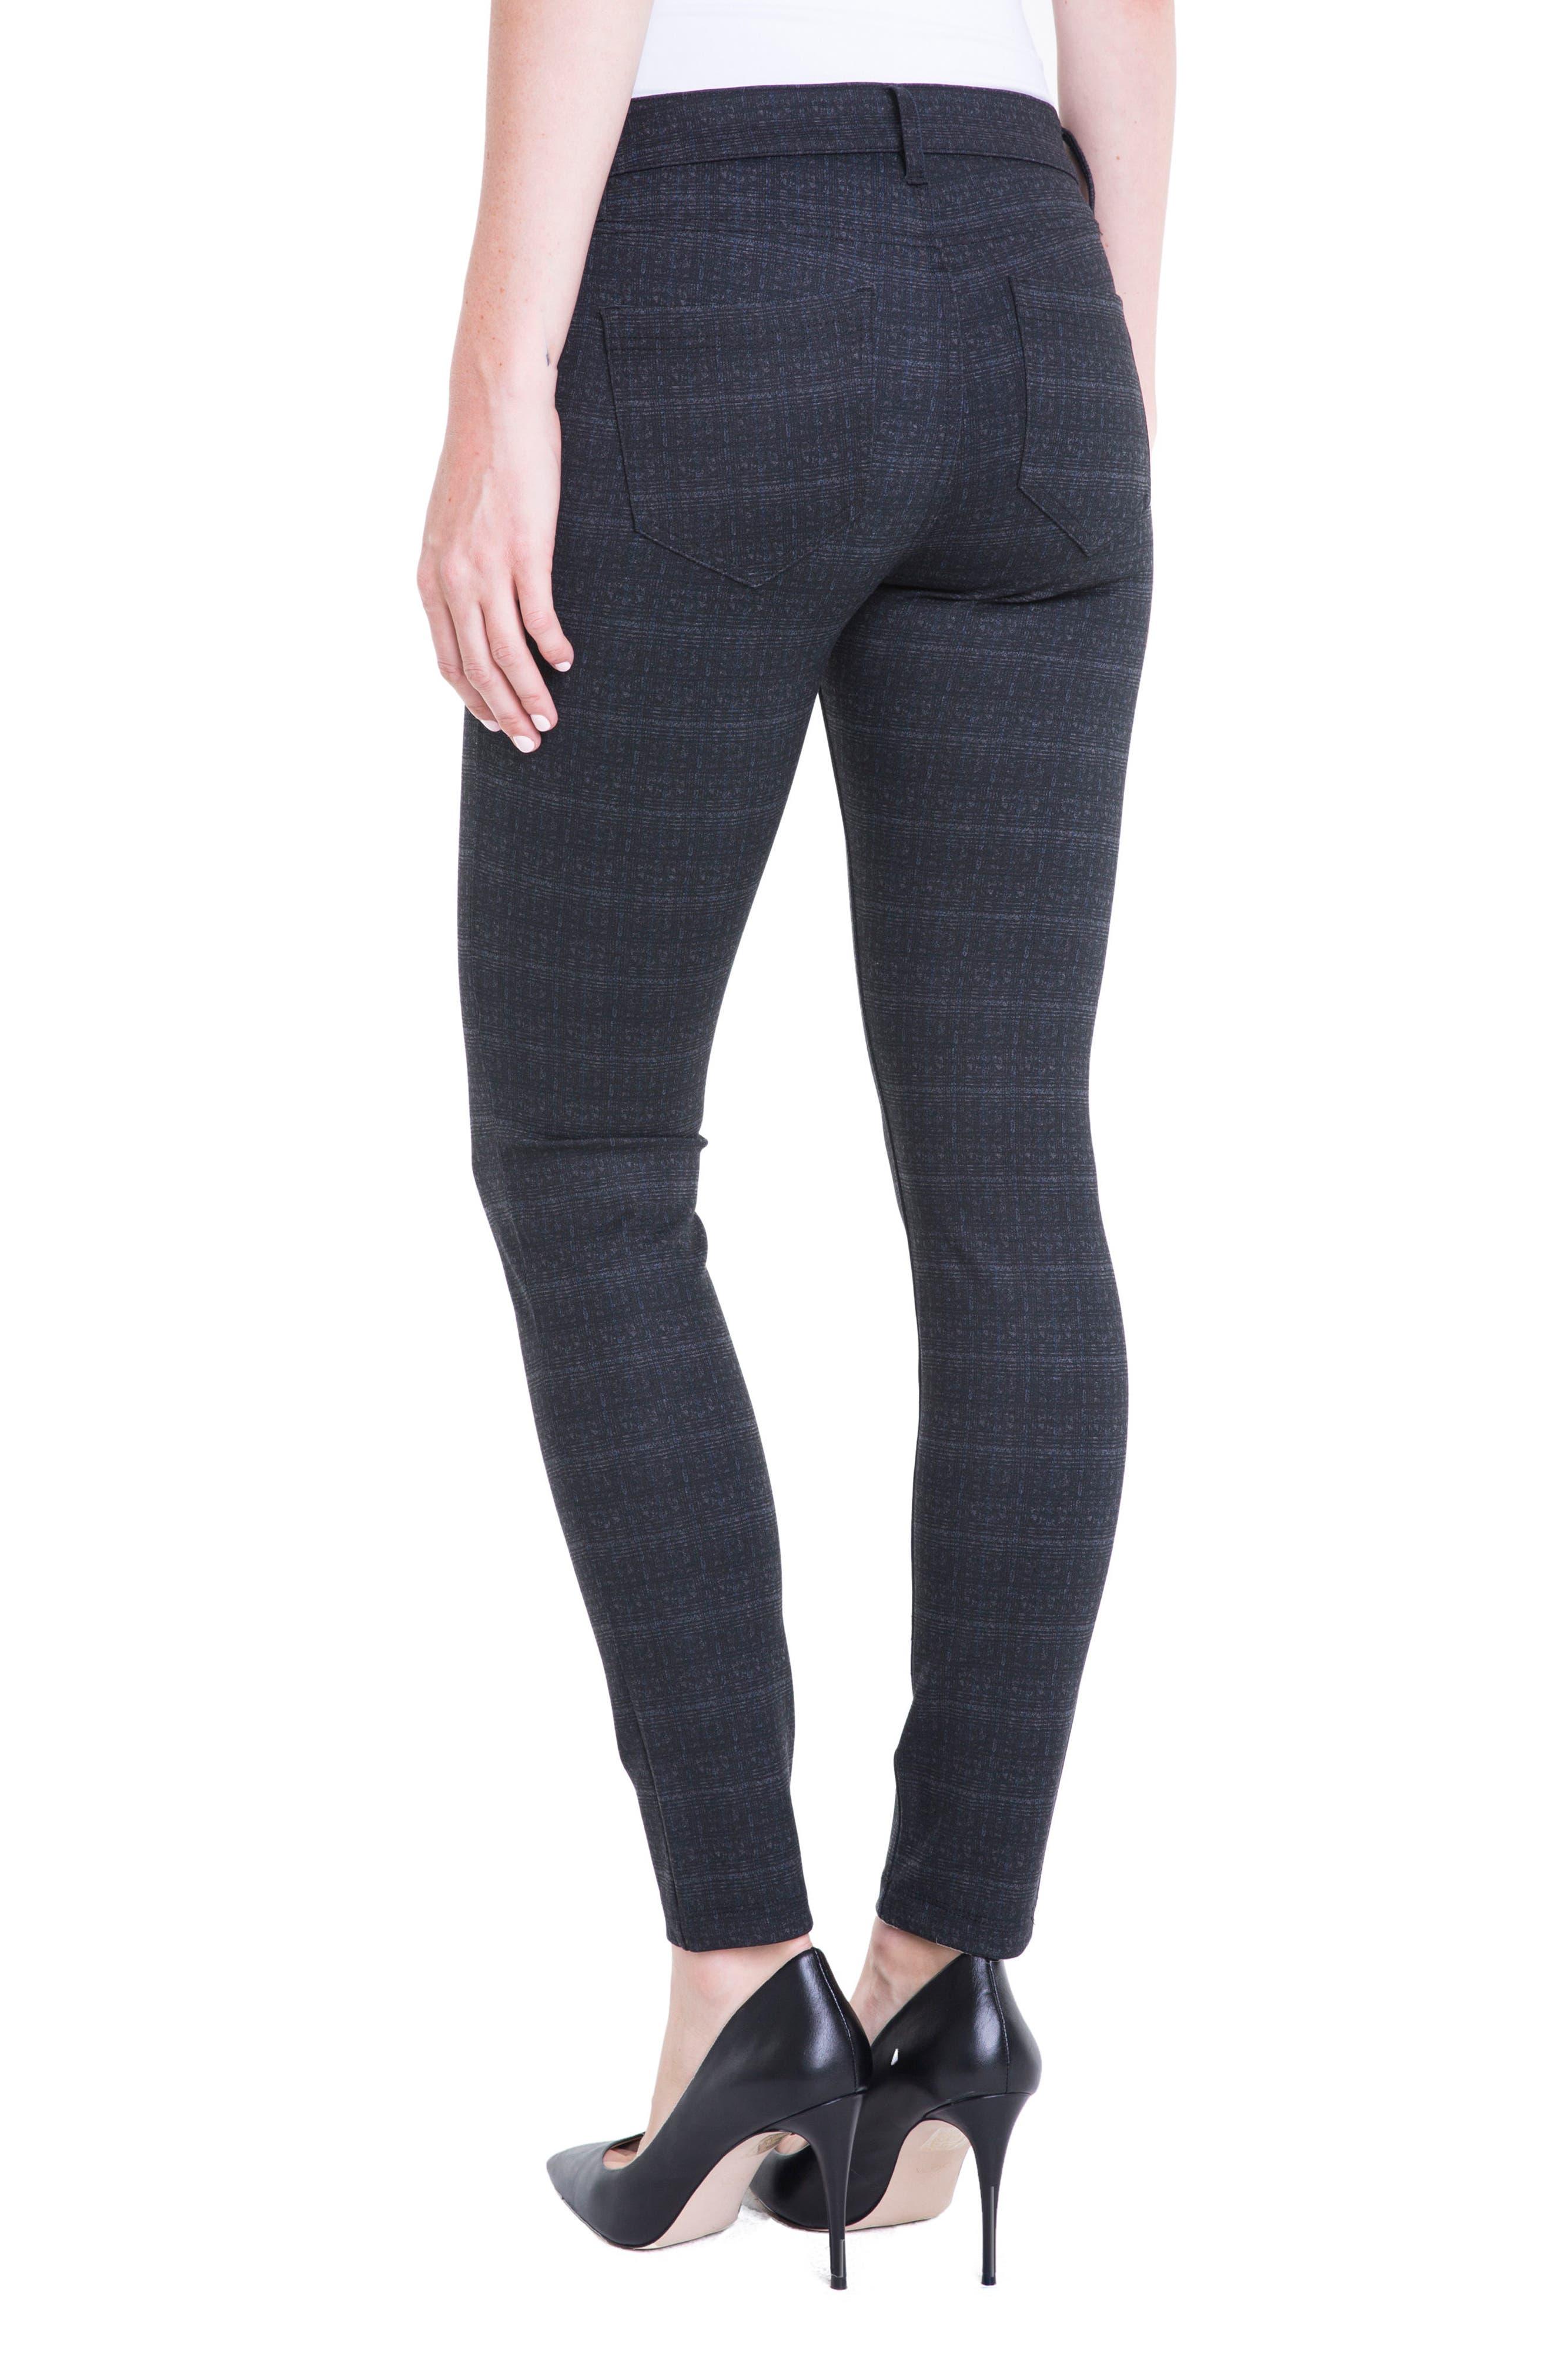 Plaid Super Skinny Ponte Knit Pants,                             Alternate thumbnail 2, color,                             Charcoal Shadow Plaid